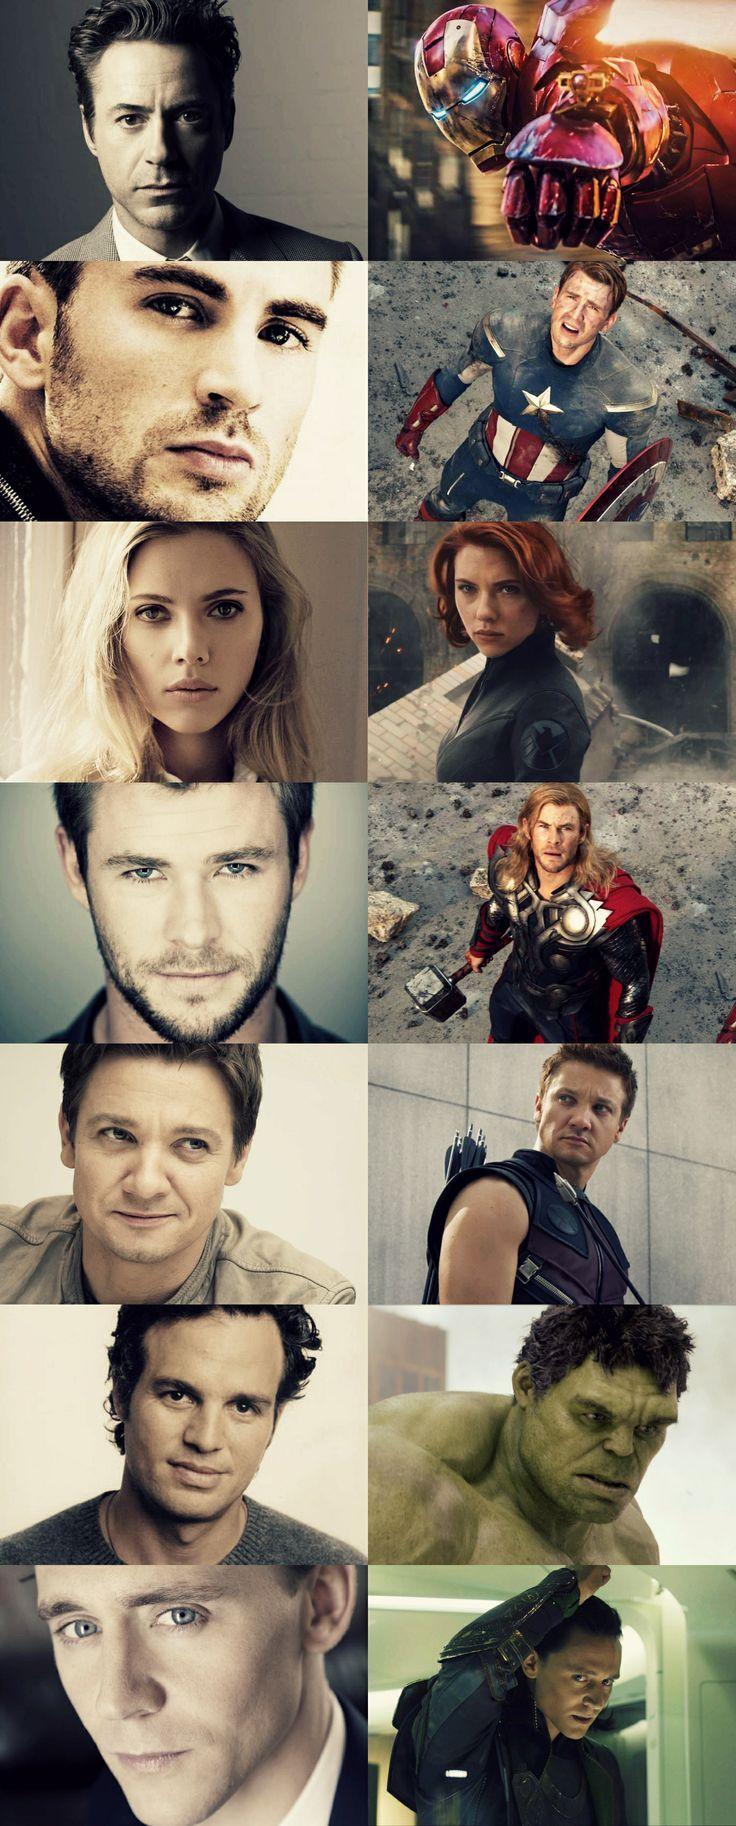 Jeremy Renner And Scarlett Johansson Fanfiction